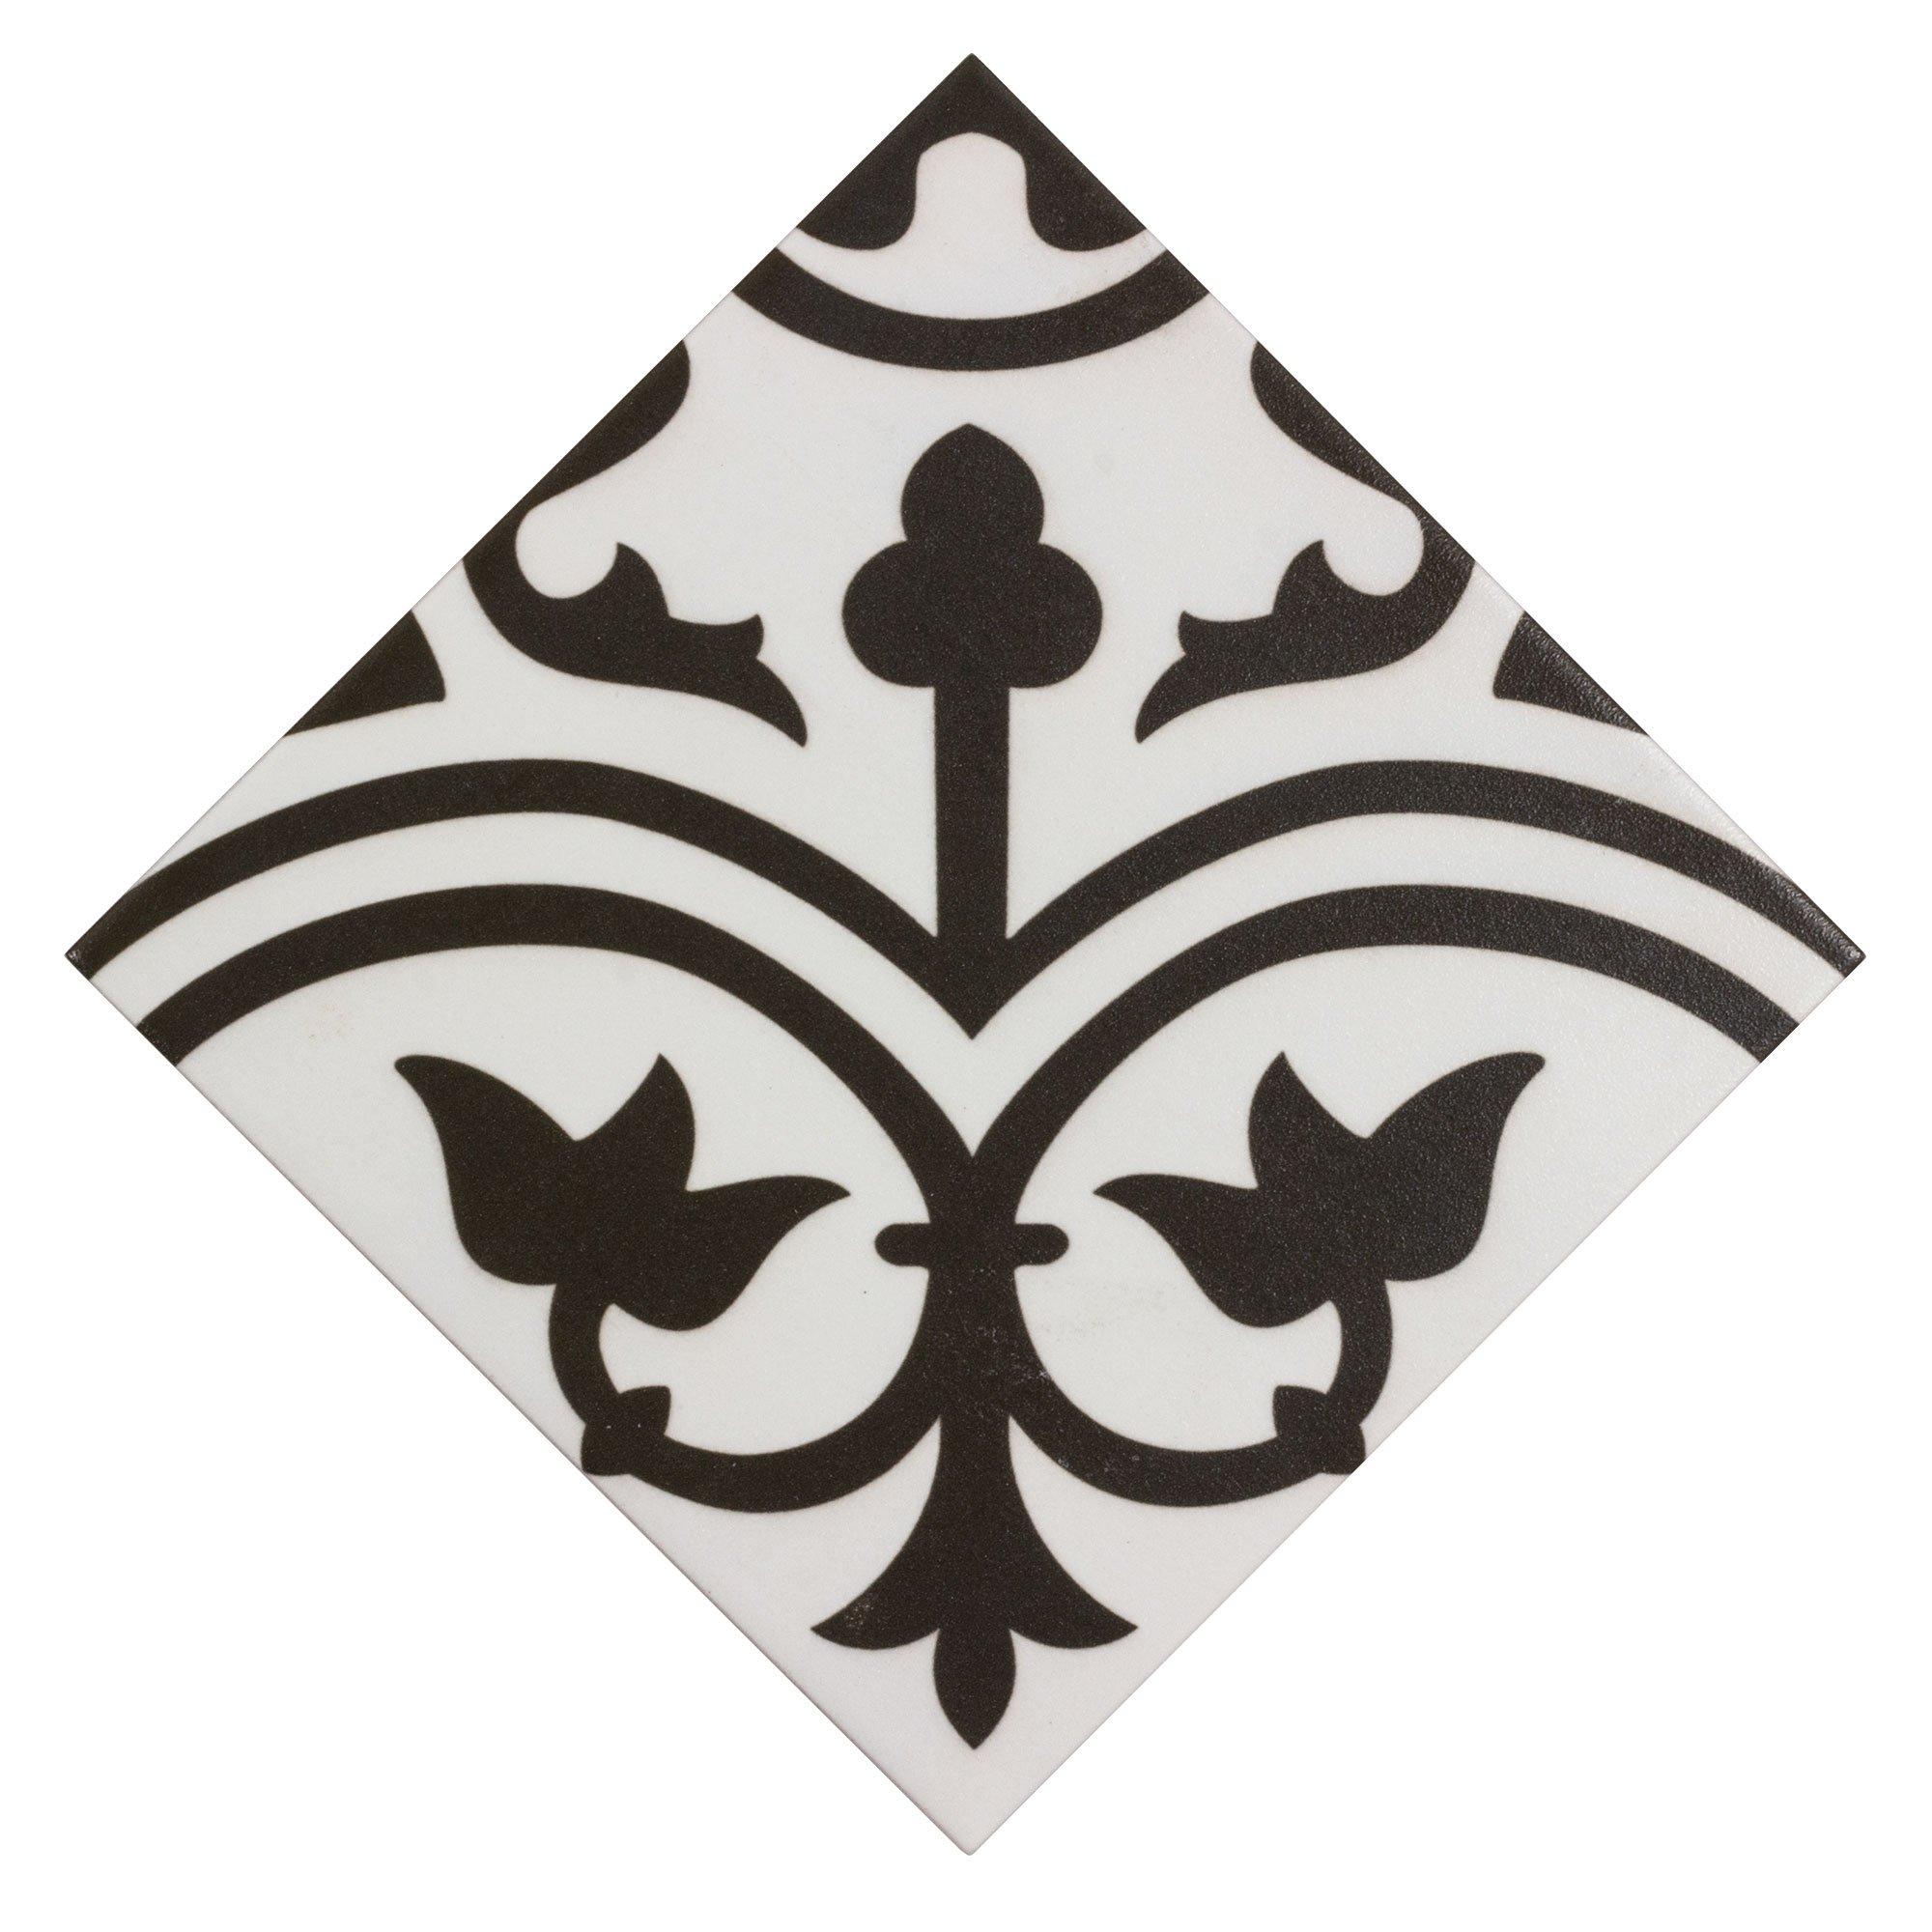 mto0473 classic 8x8 deco black white arabesque pattern spanish ceramic mosaic tile walmart com